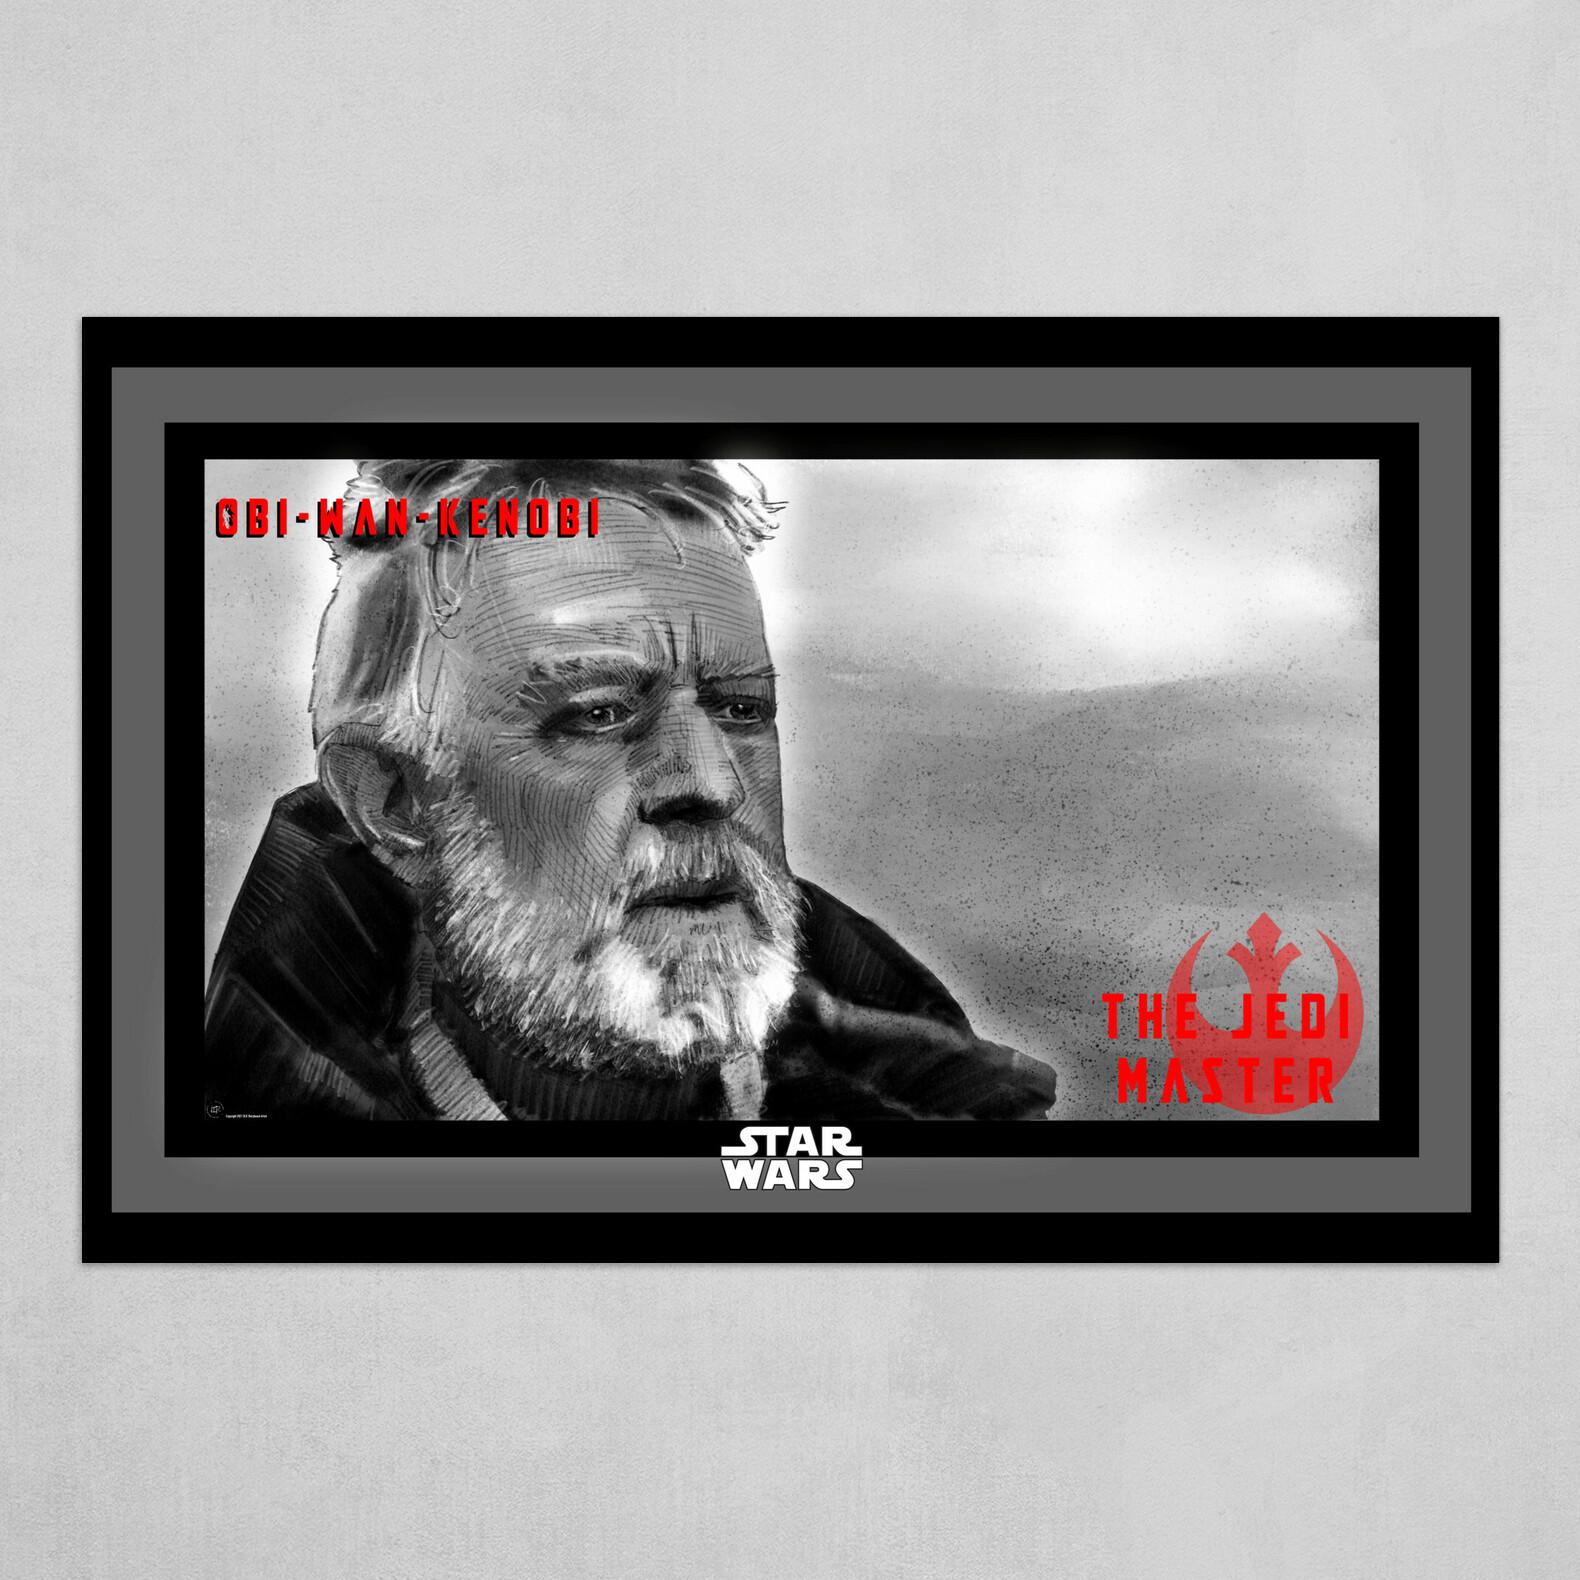 Obi-Wan-Kenobi Poster in B&W with Red